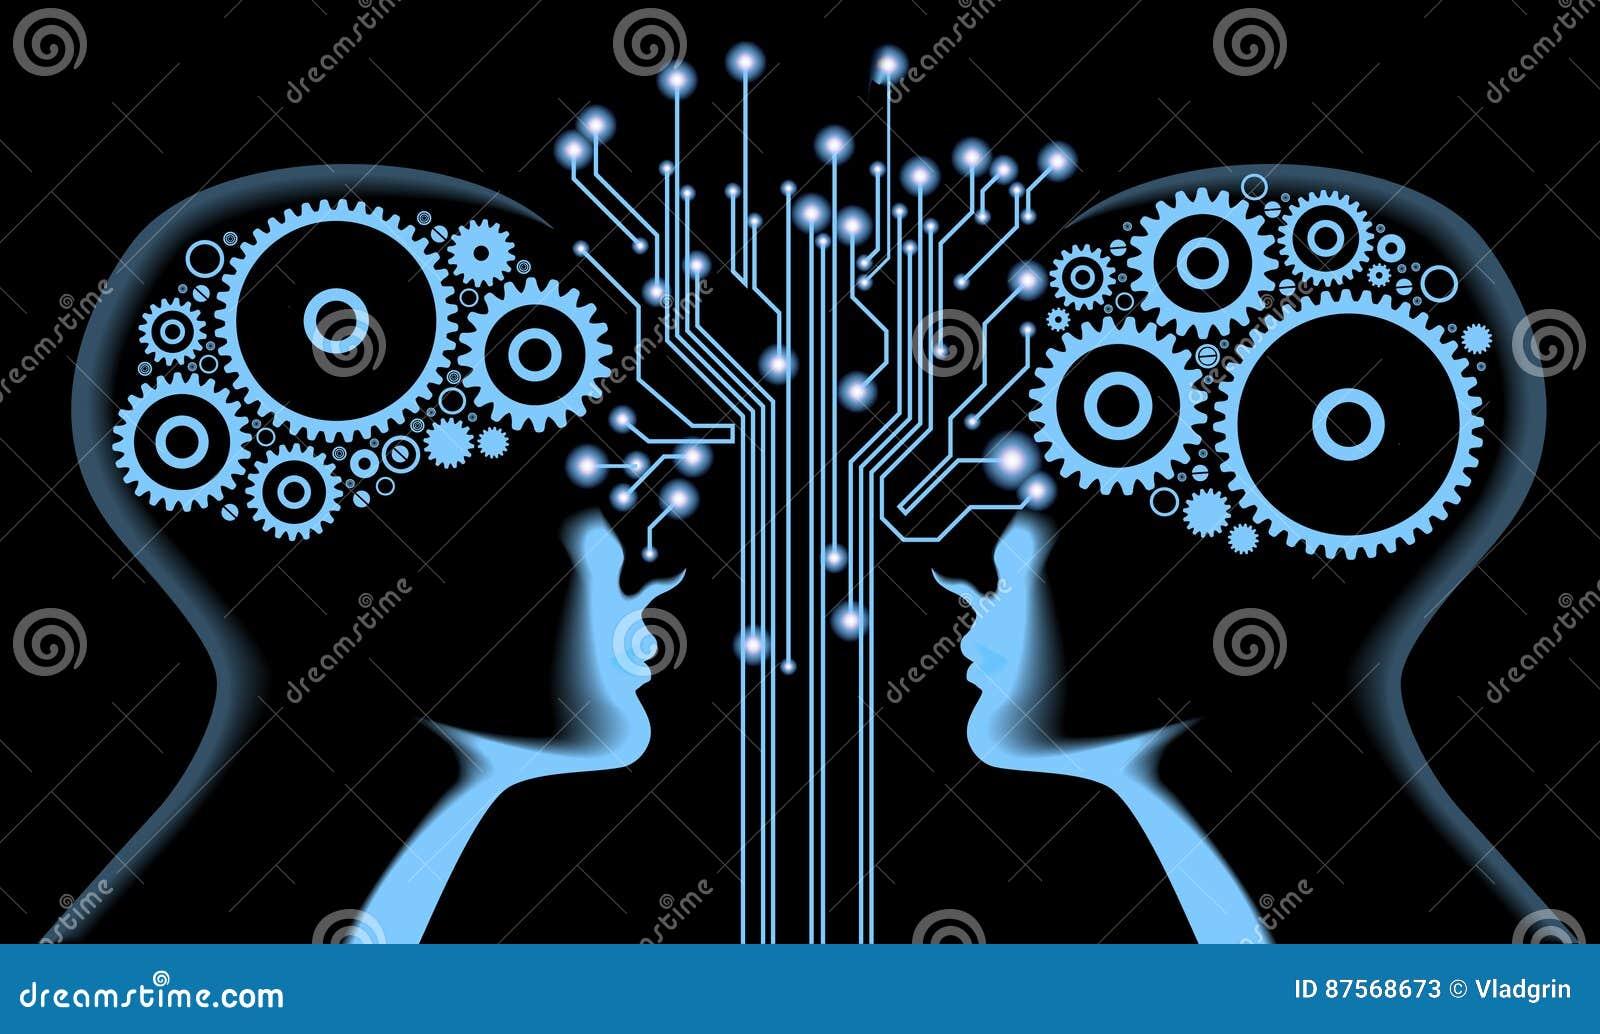 Electrical Circuit Brain Man Concept Vector Illustration